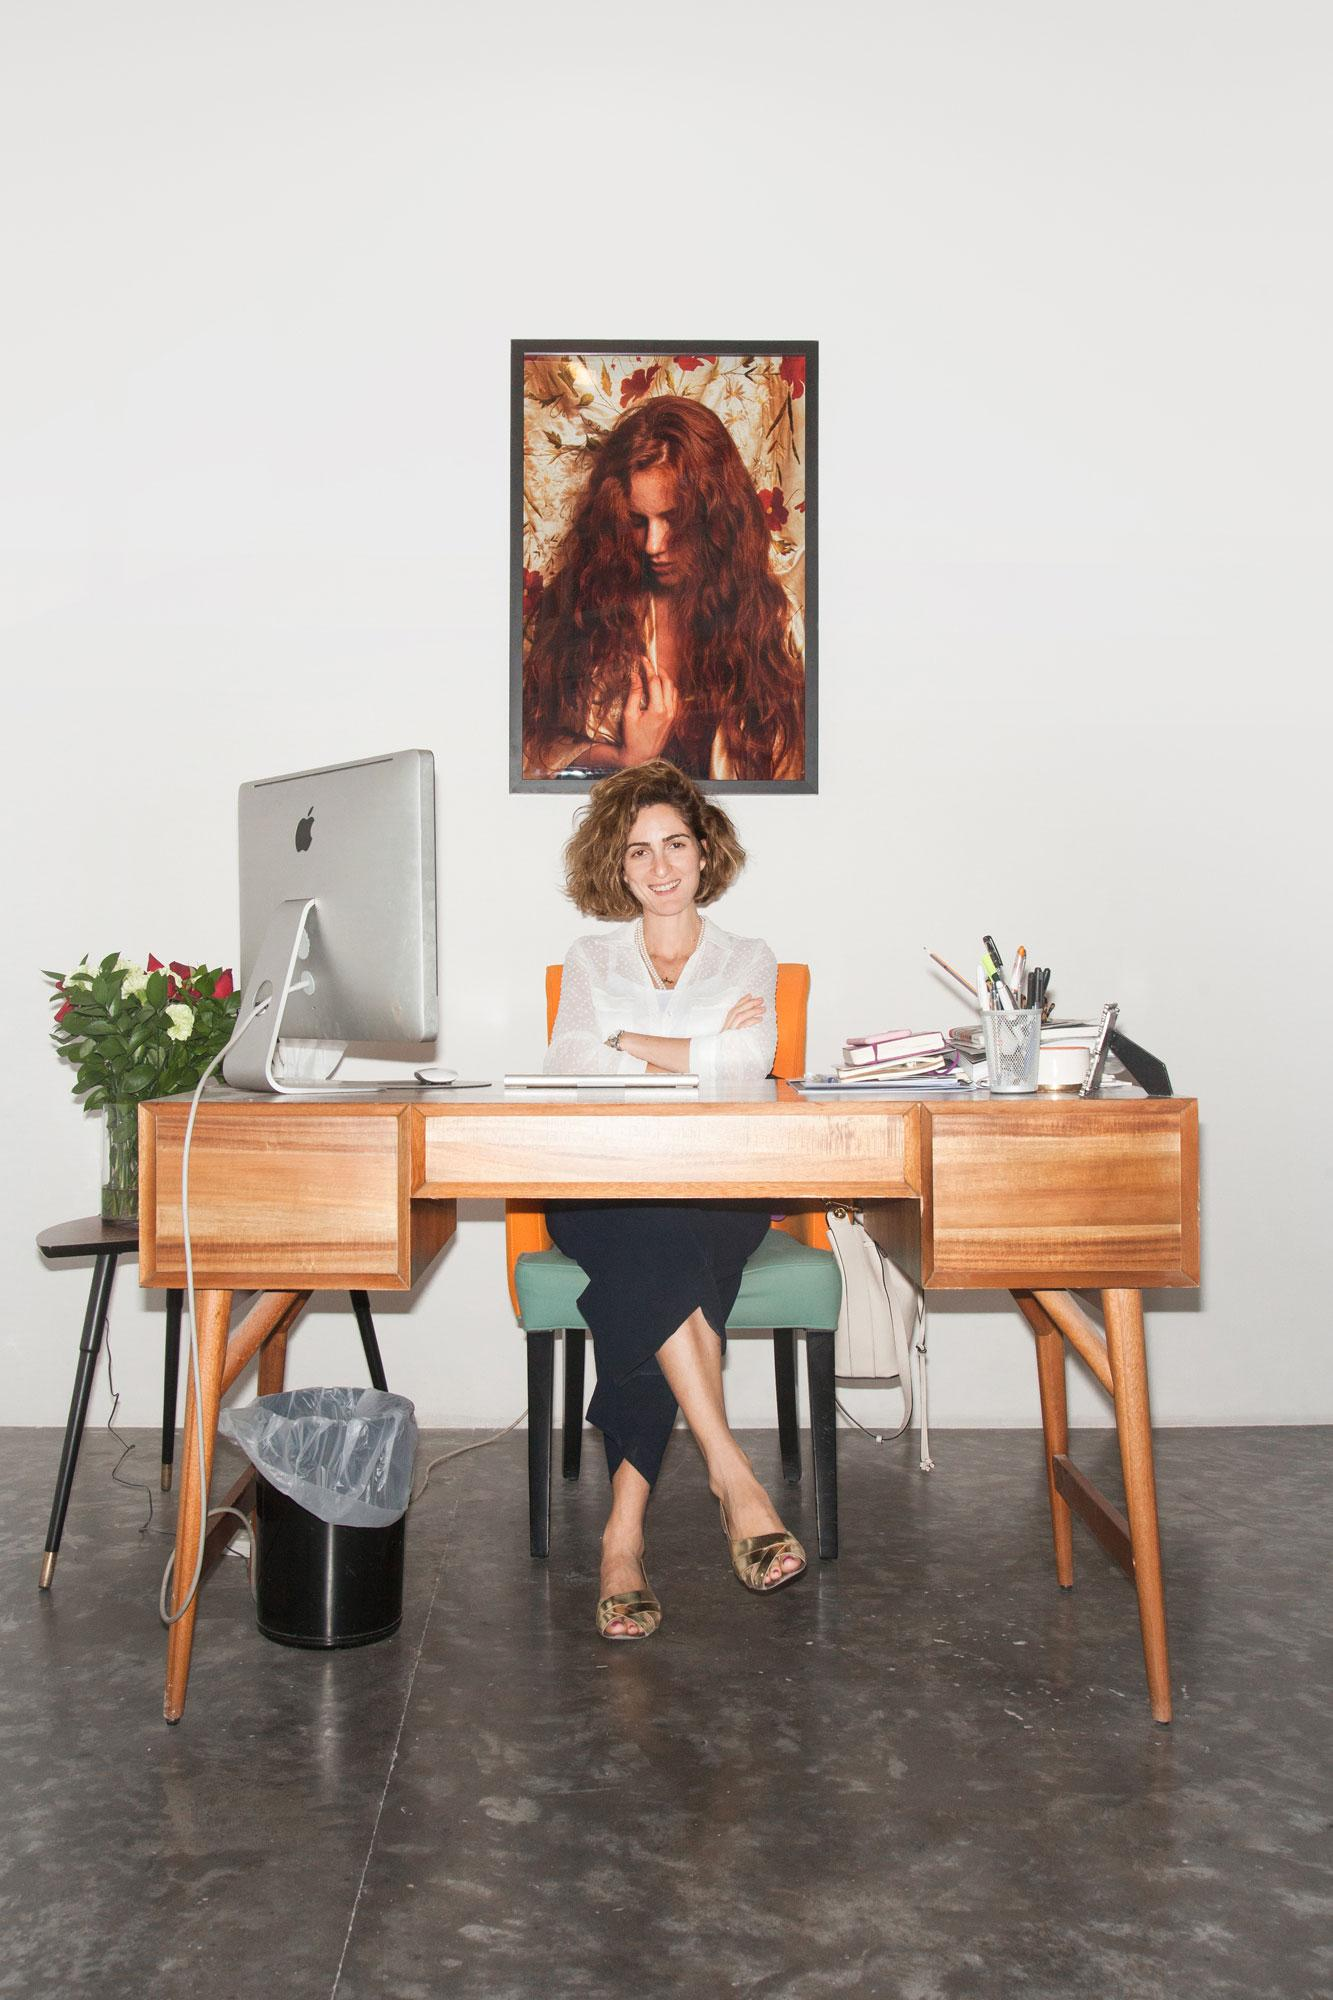 Yasmin Atassi, director of Green Art Gallery /A Pre-Raphaelite picture /byNazif Topçuoglu in the background